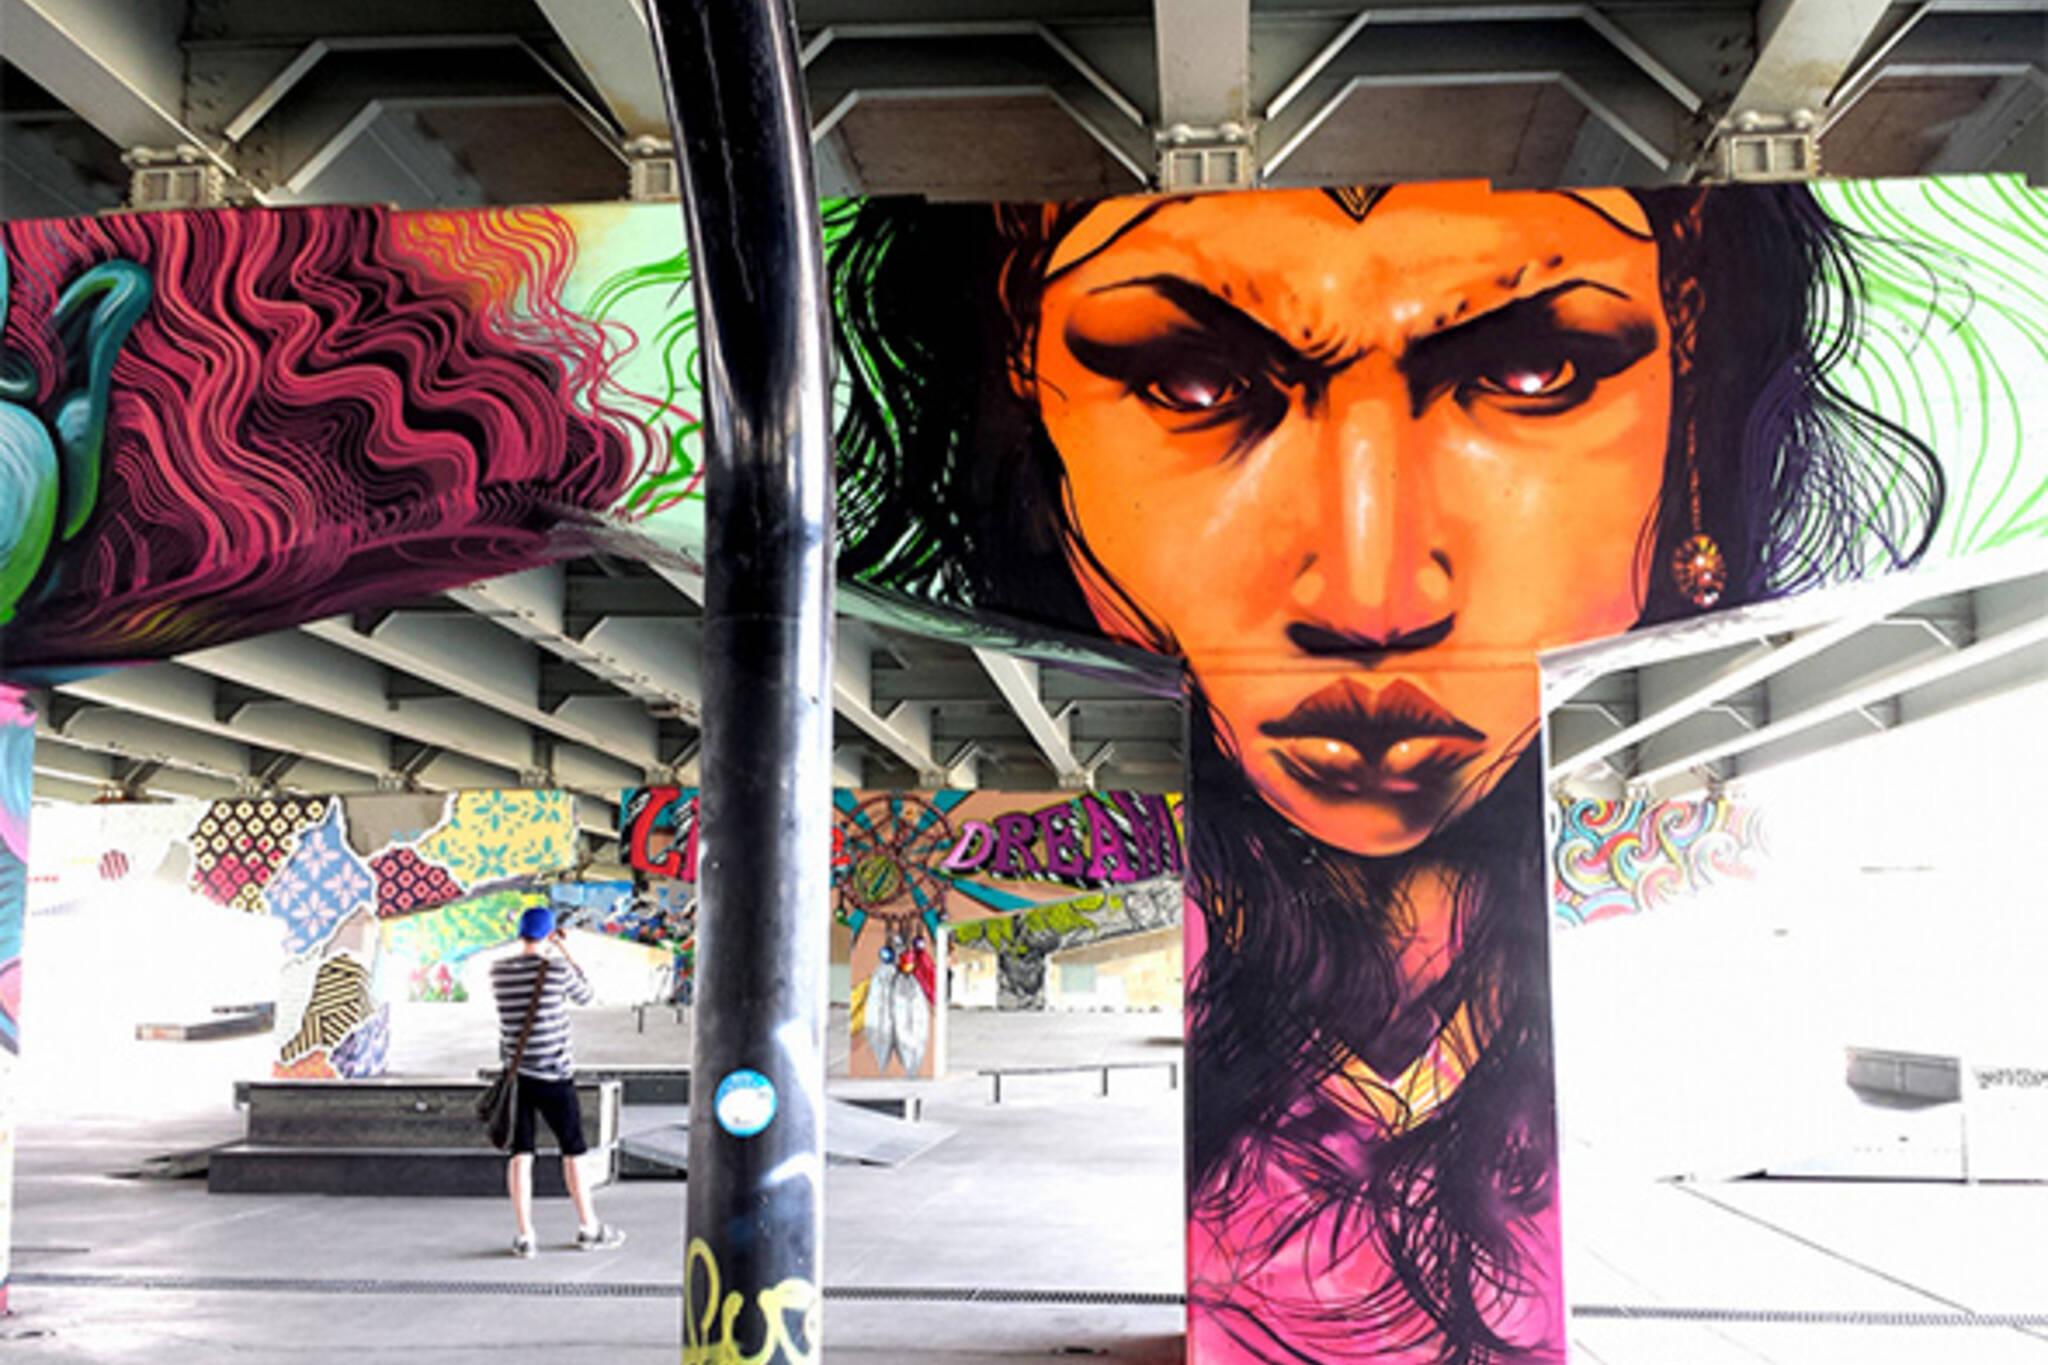 Underpass park graffiti